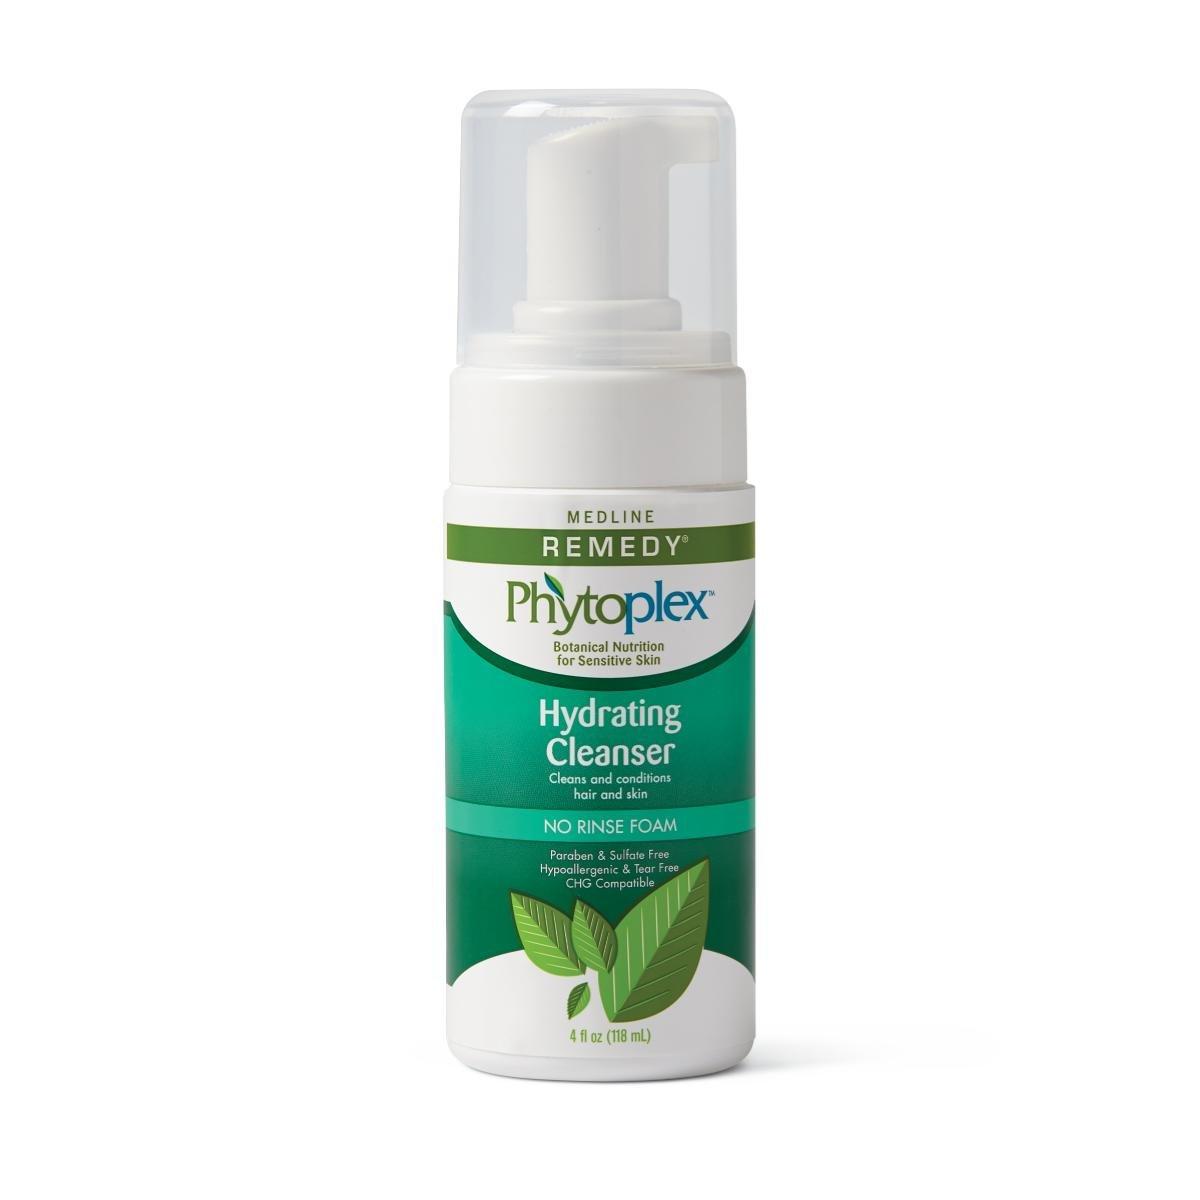 MEDLINE MSC092104 MSC092104H Remedy Phytoplex Hydrating Cleansing Foam